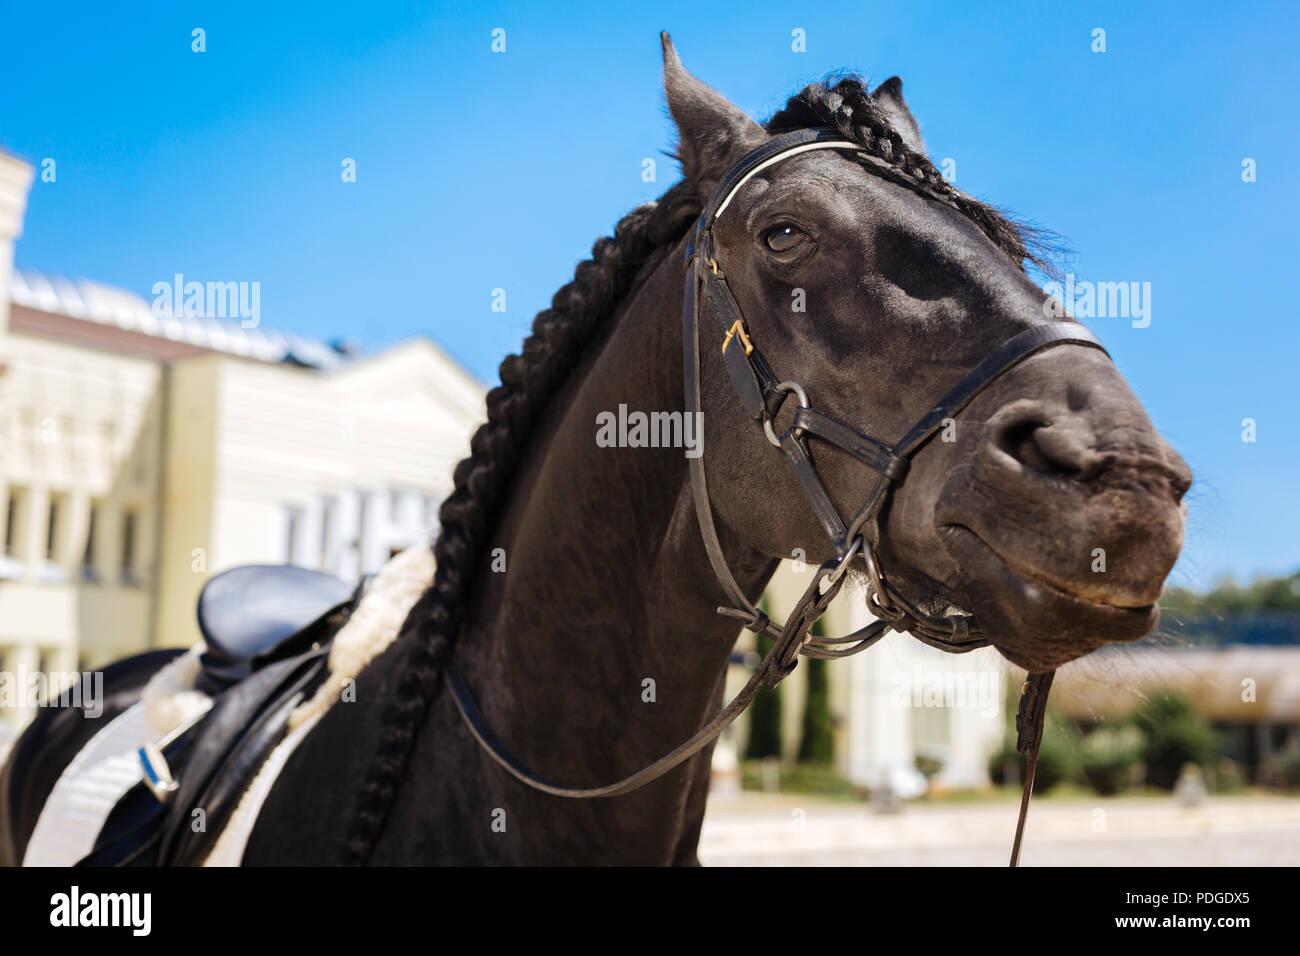 Black Dark-eyed Pferd unterwürfig auf Big Race track Stockbild